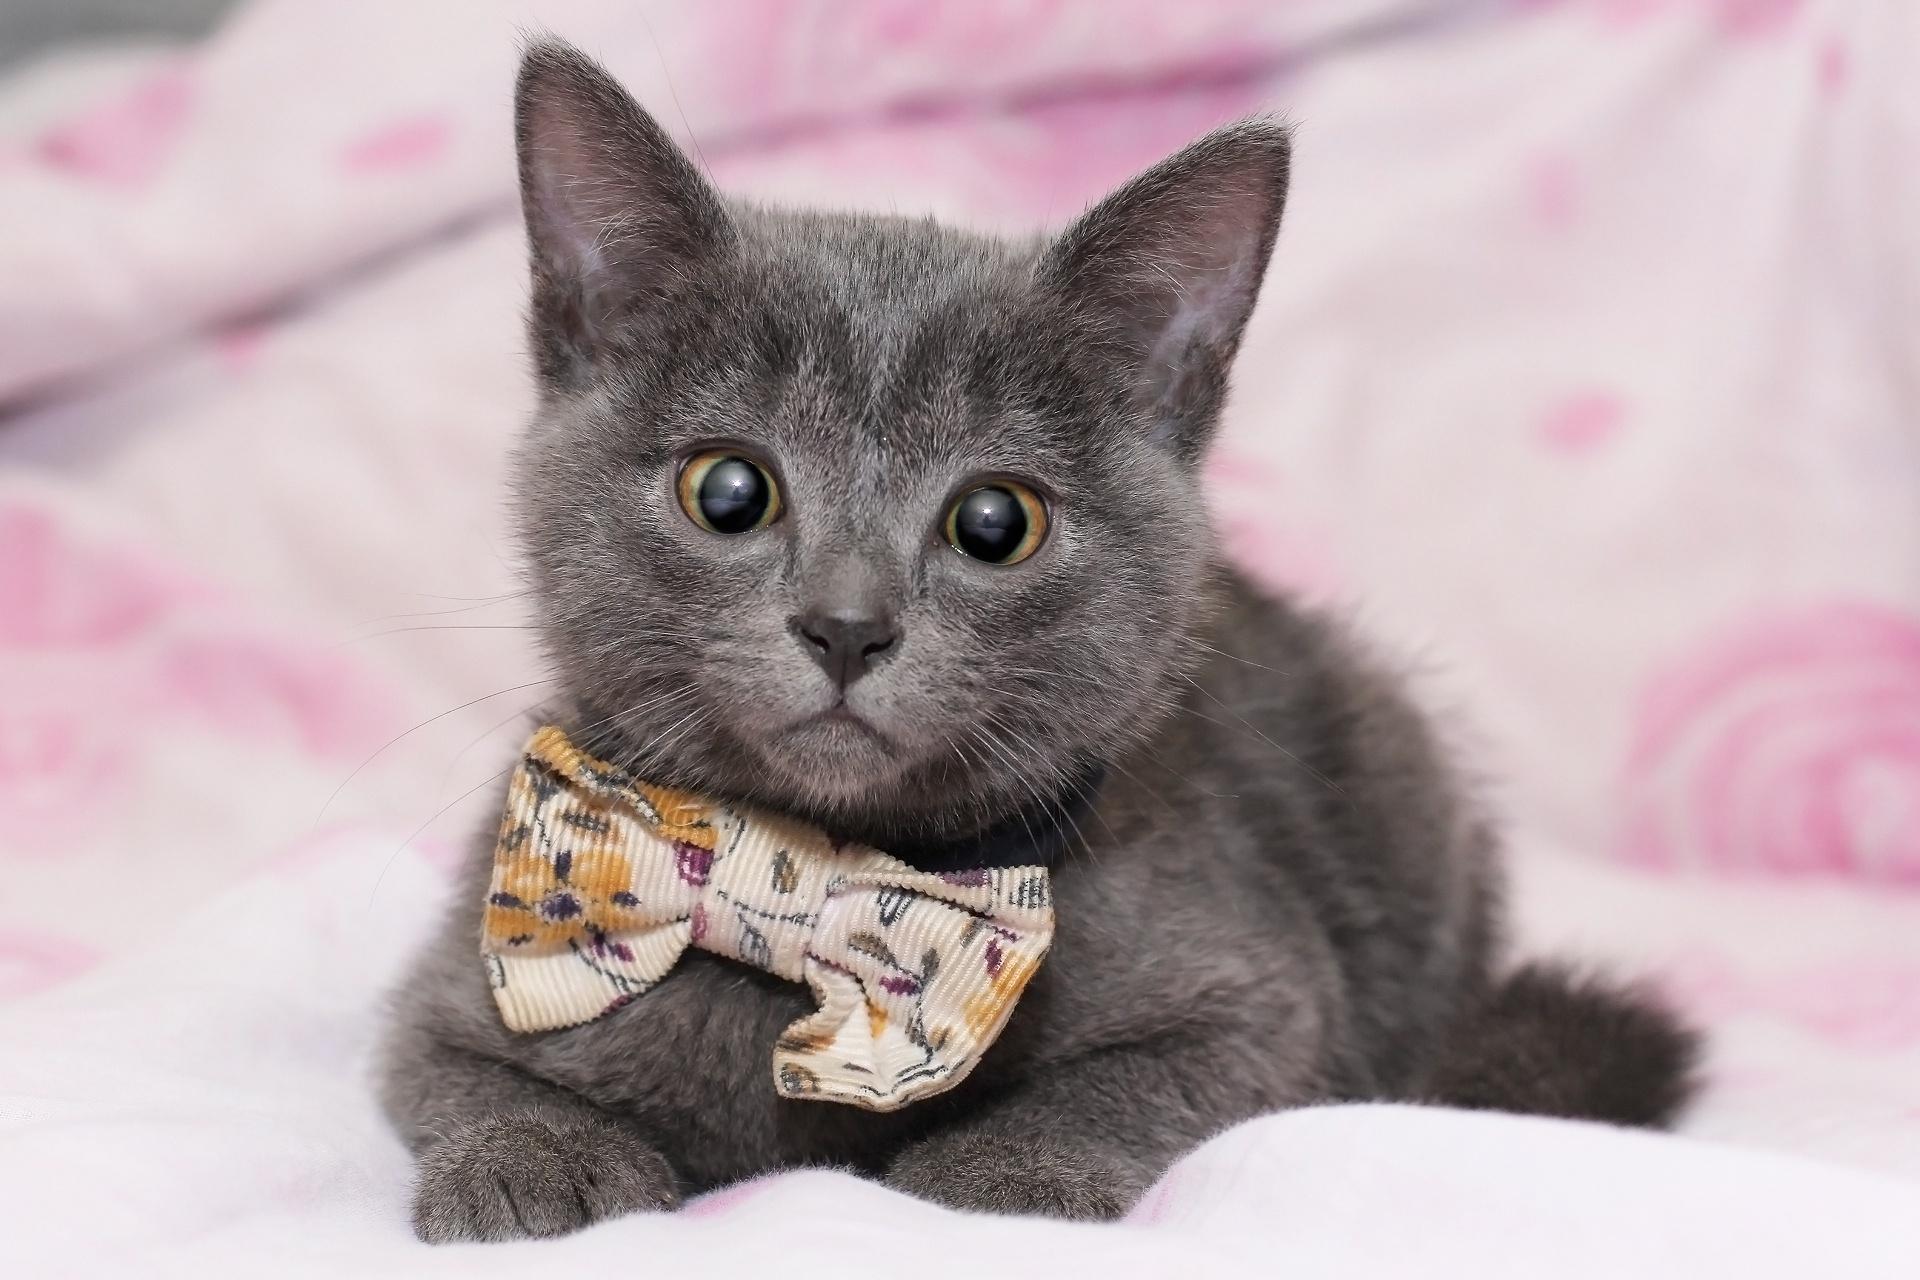 Baby Animal Cat Kitten Pet Stare 1920x1280